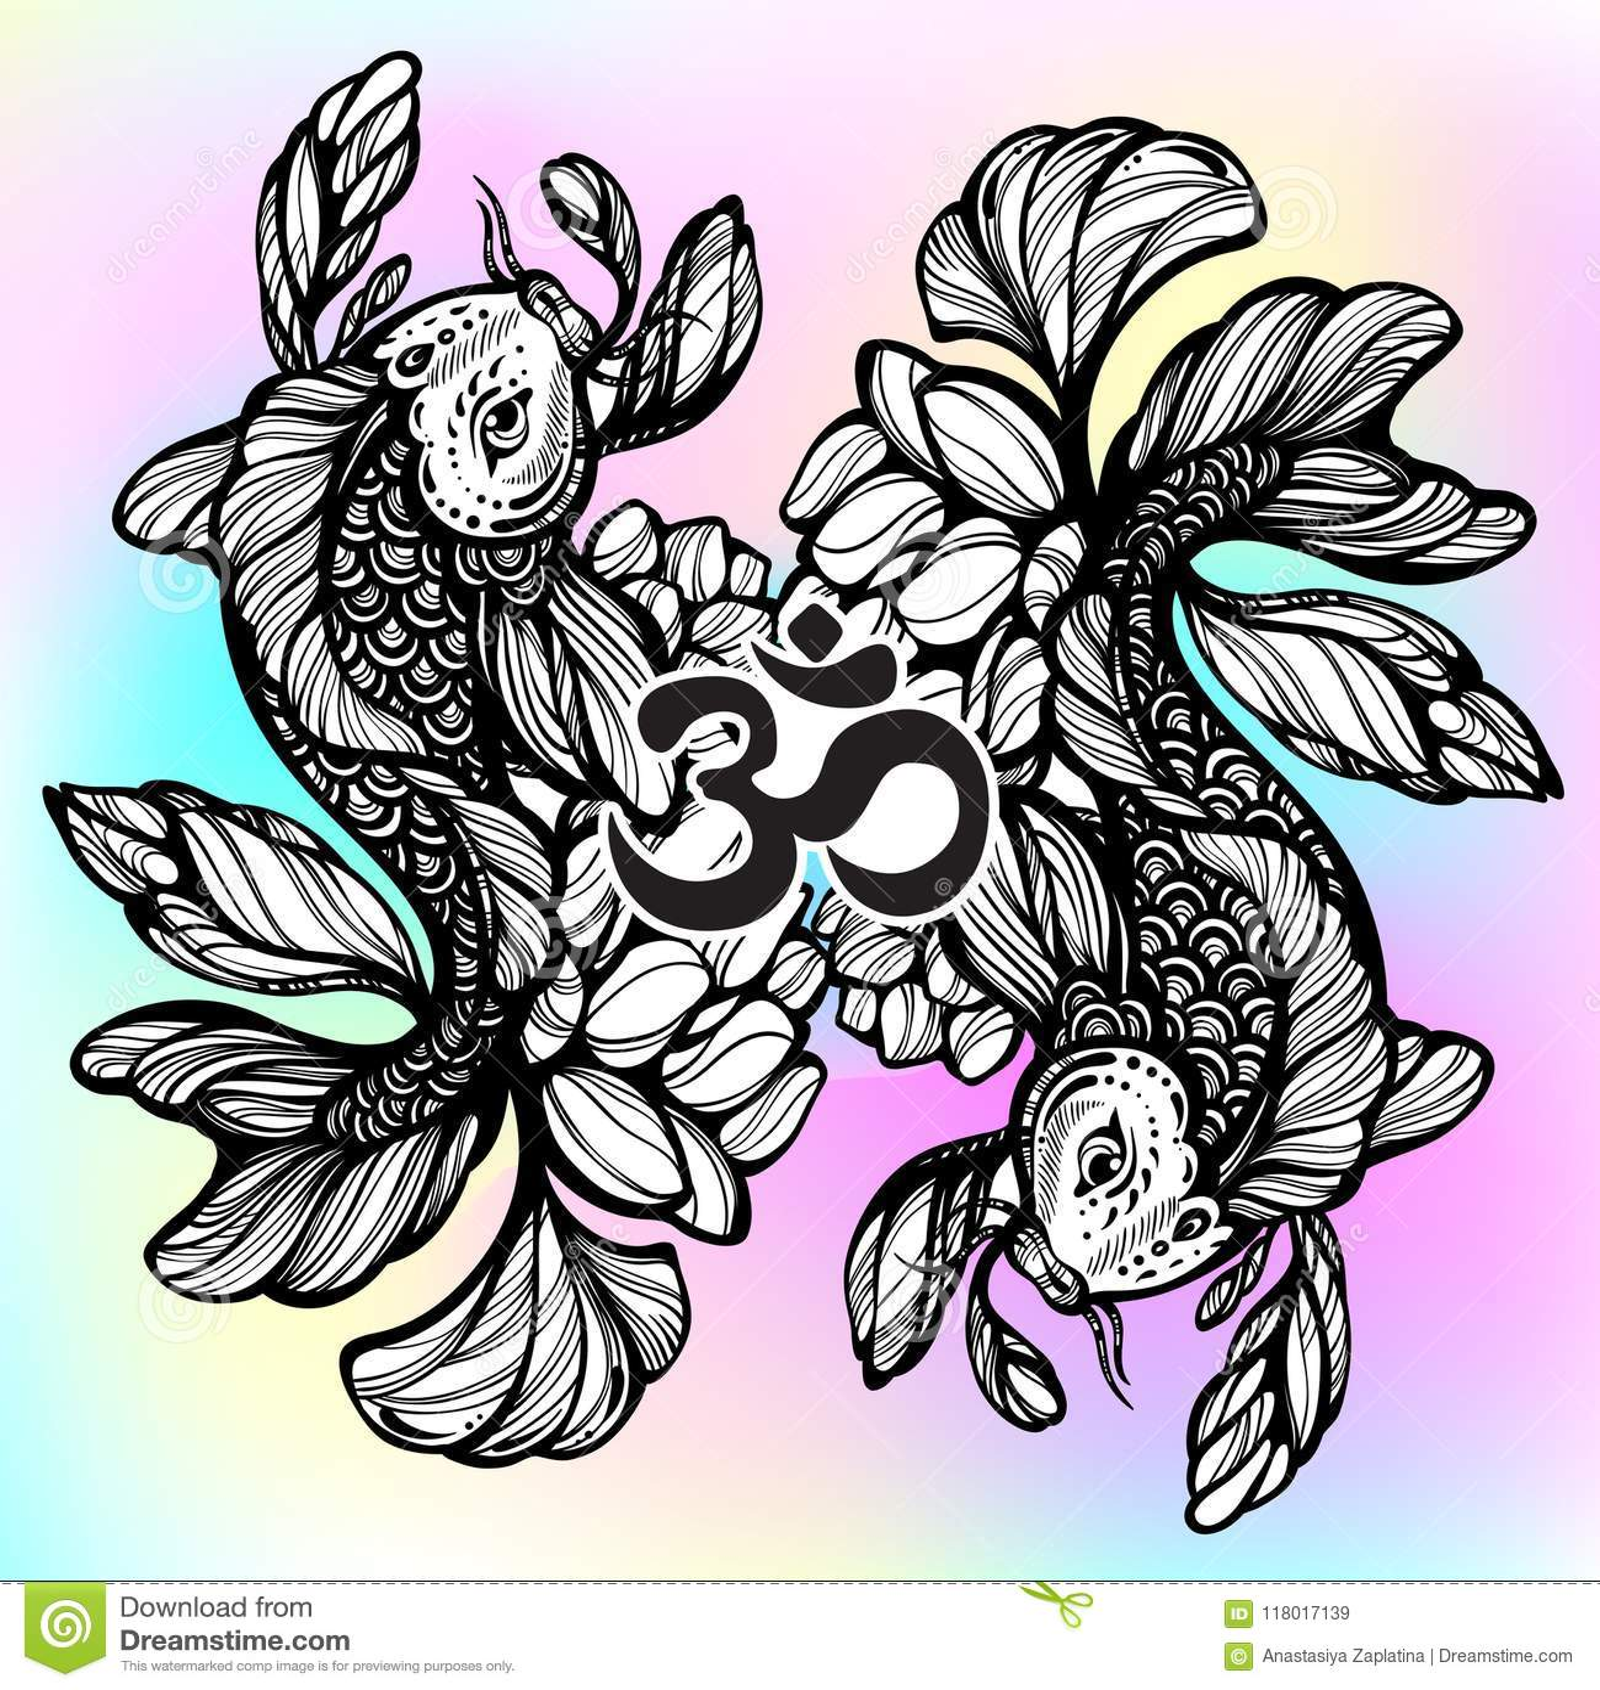 Beautiful hand drawn oriental illustration of koi carp fish with download beautiful hand drawn oriental illustration of koi carp fish with lotus flower around izmirmasajfo